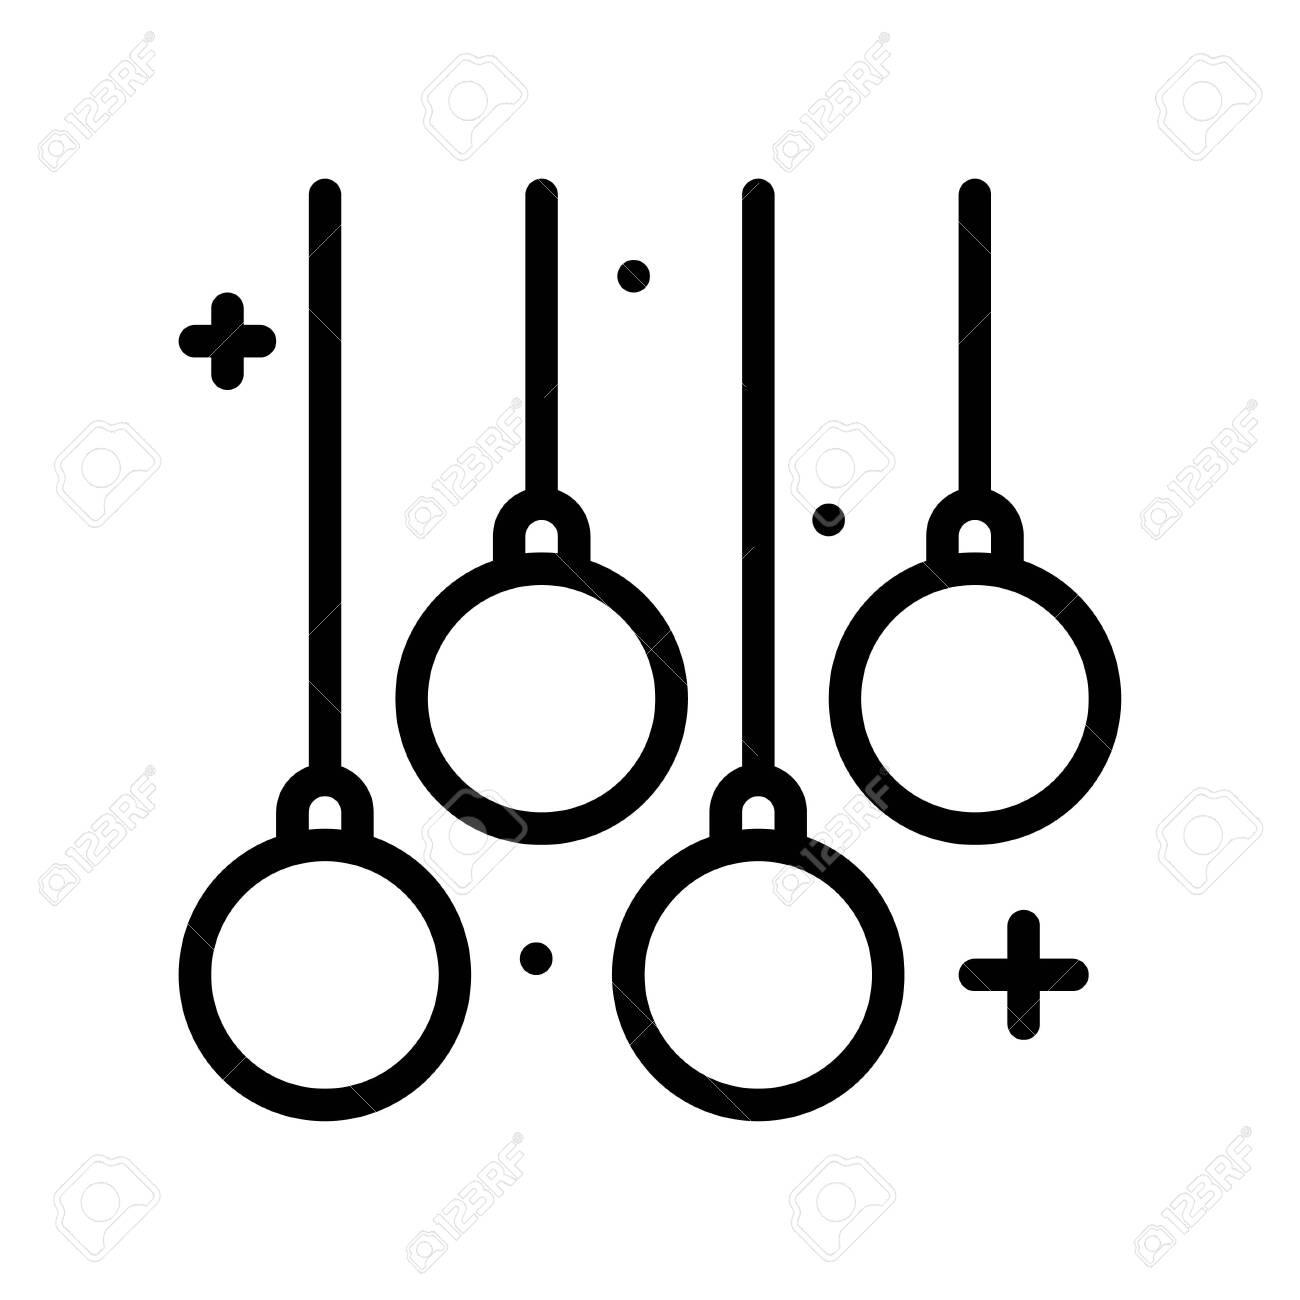 Christmas lights line design icon, vector illustration - 136139999